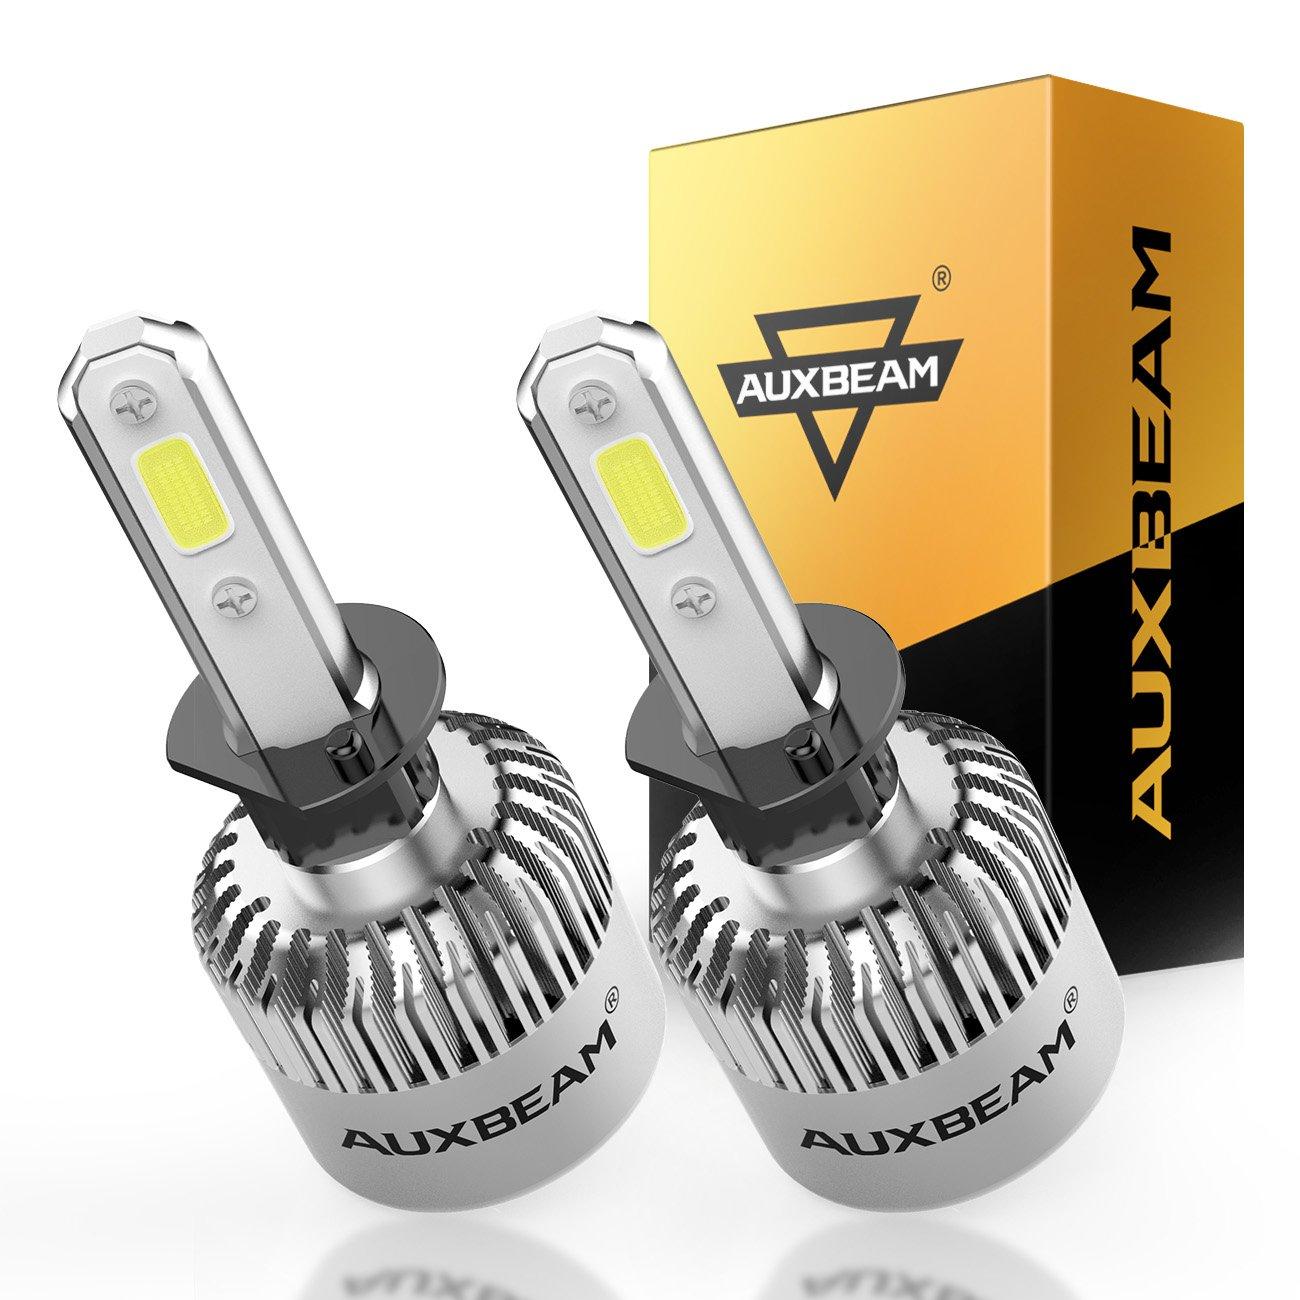 Auxbeam LED Headlights F-S2 Series H1 P145S Headlight Bulbs High Brightness H1 P145S Headlight Conversion Kit with 2 Pcs of H1 Bulbs 72W 8000lm COB Led Chips Single Beam - 2 Year Warranty